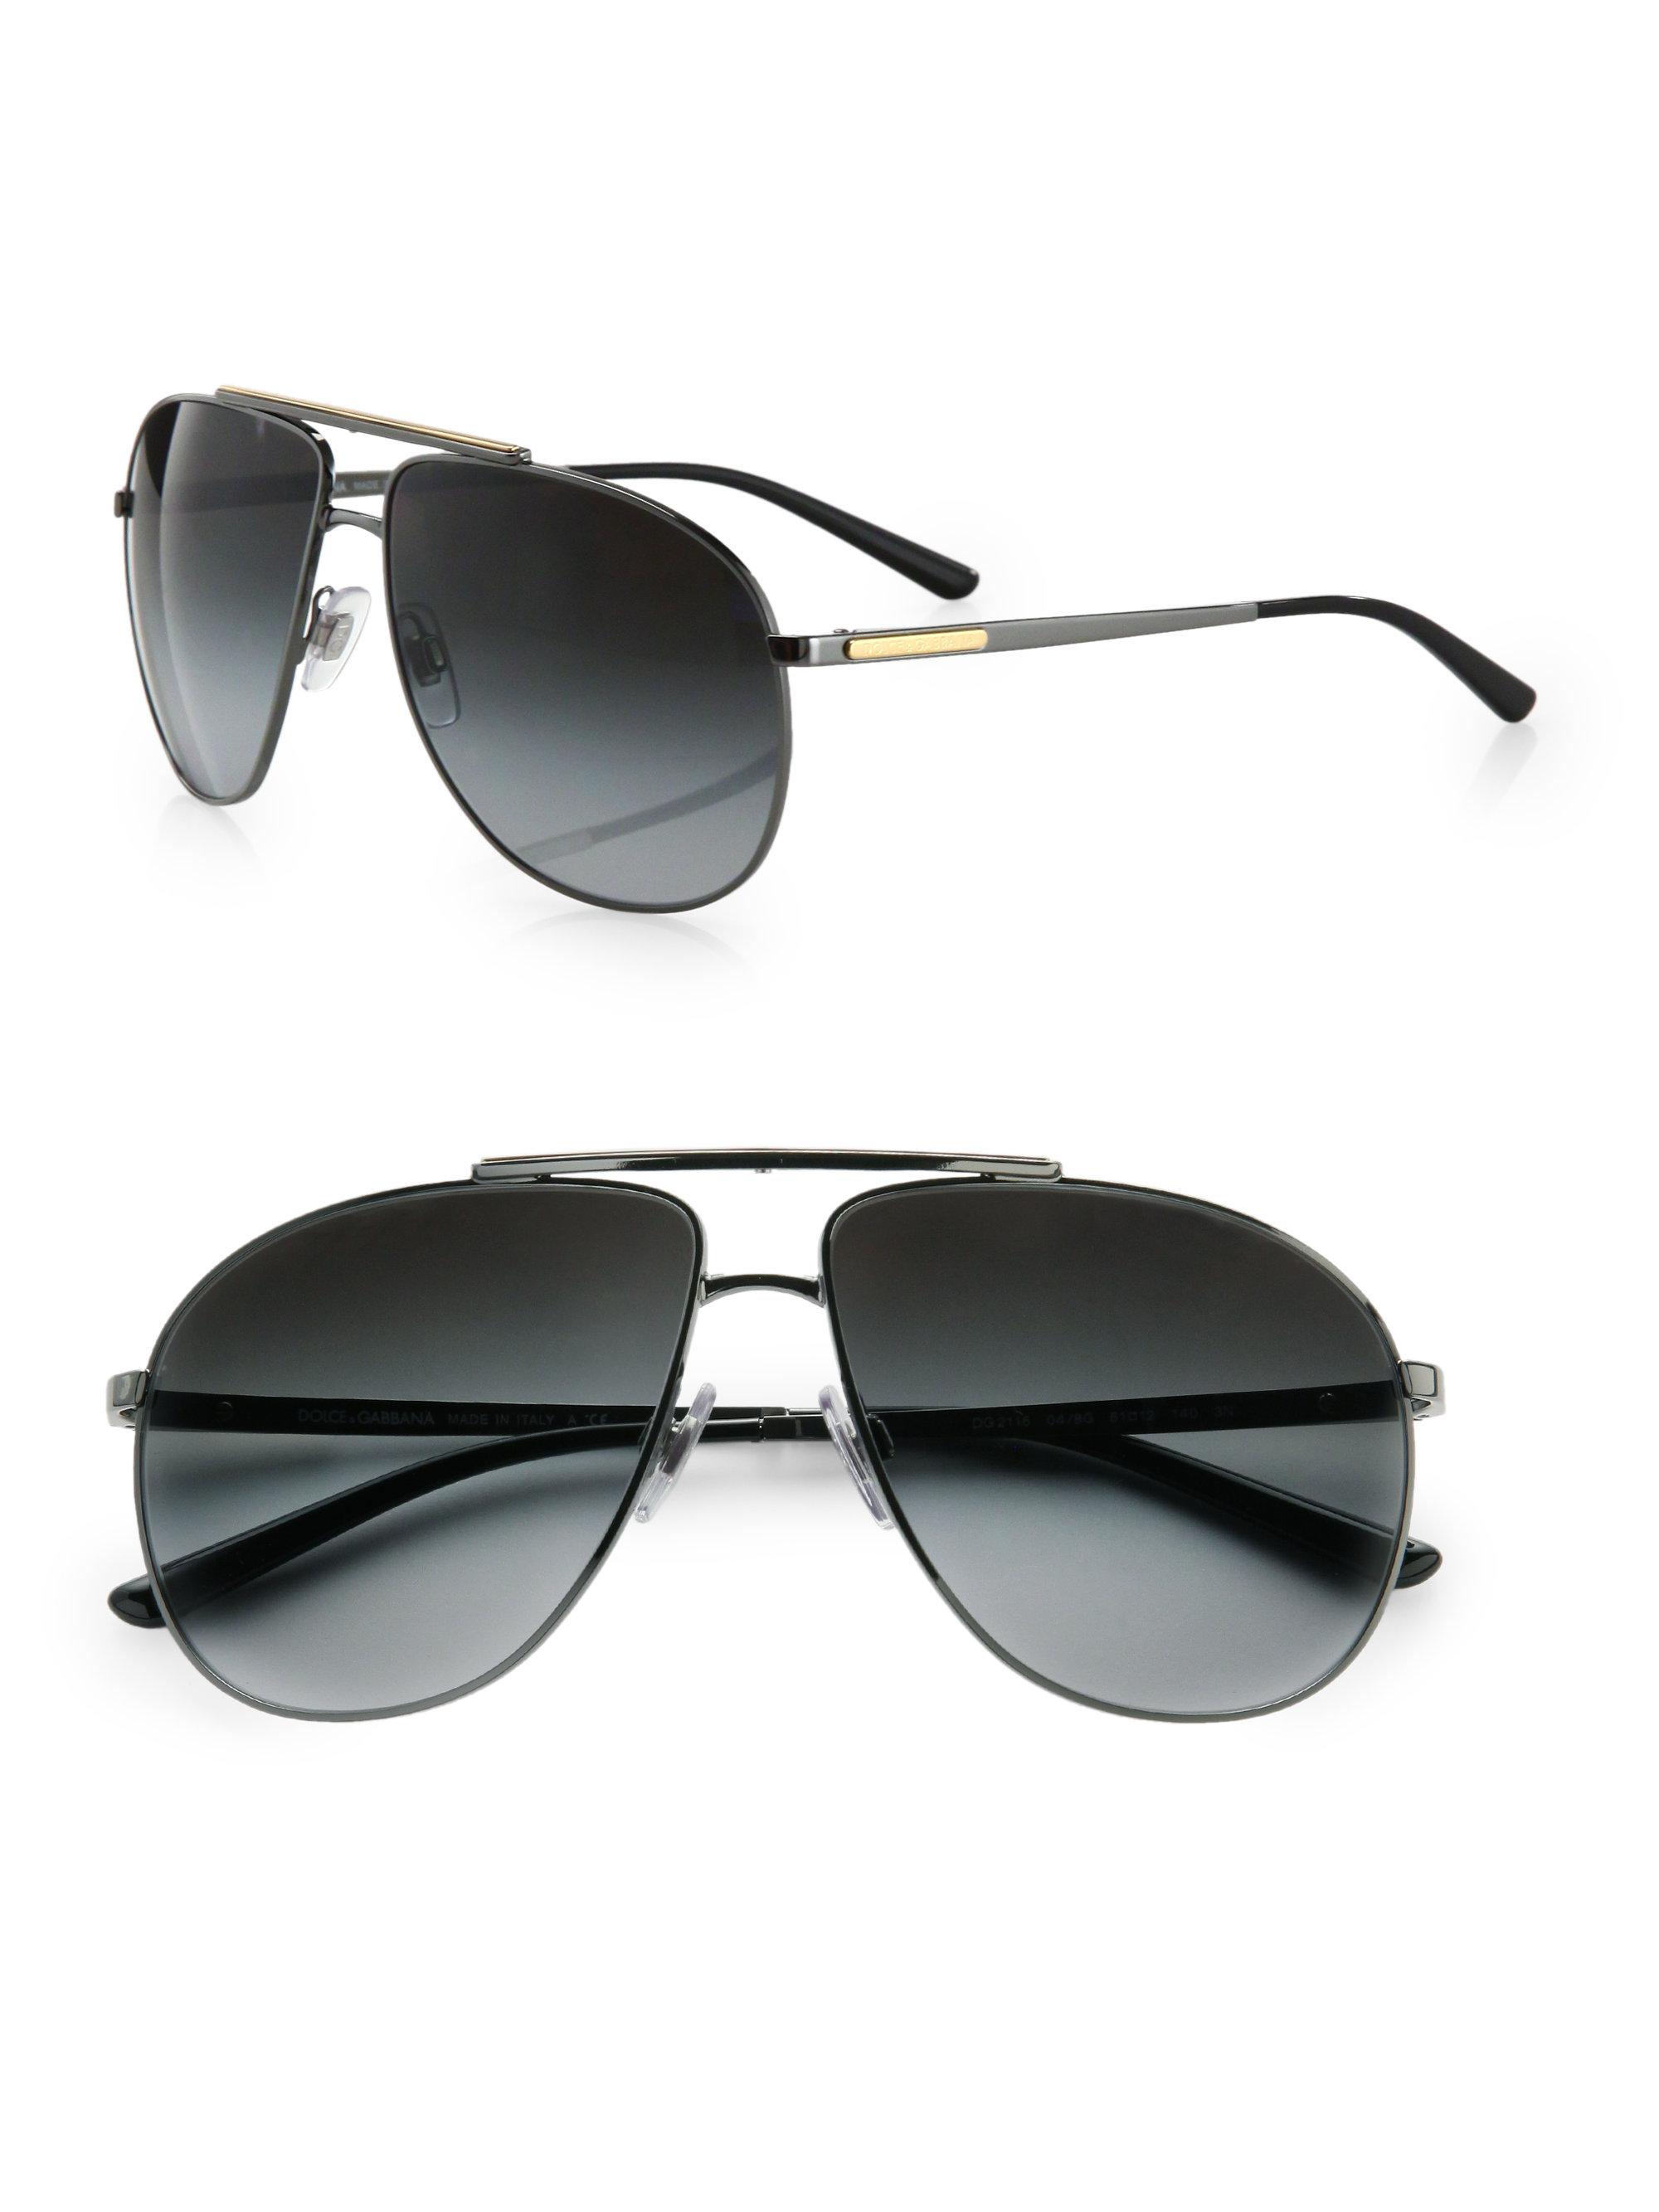 Dolce Gabbana Sunglasses Black  dolce gabbana metal aviator sunglasses in black for men lyst